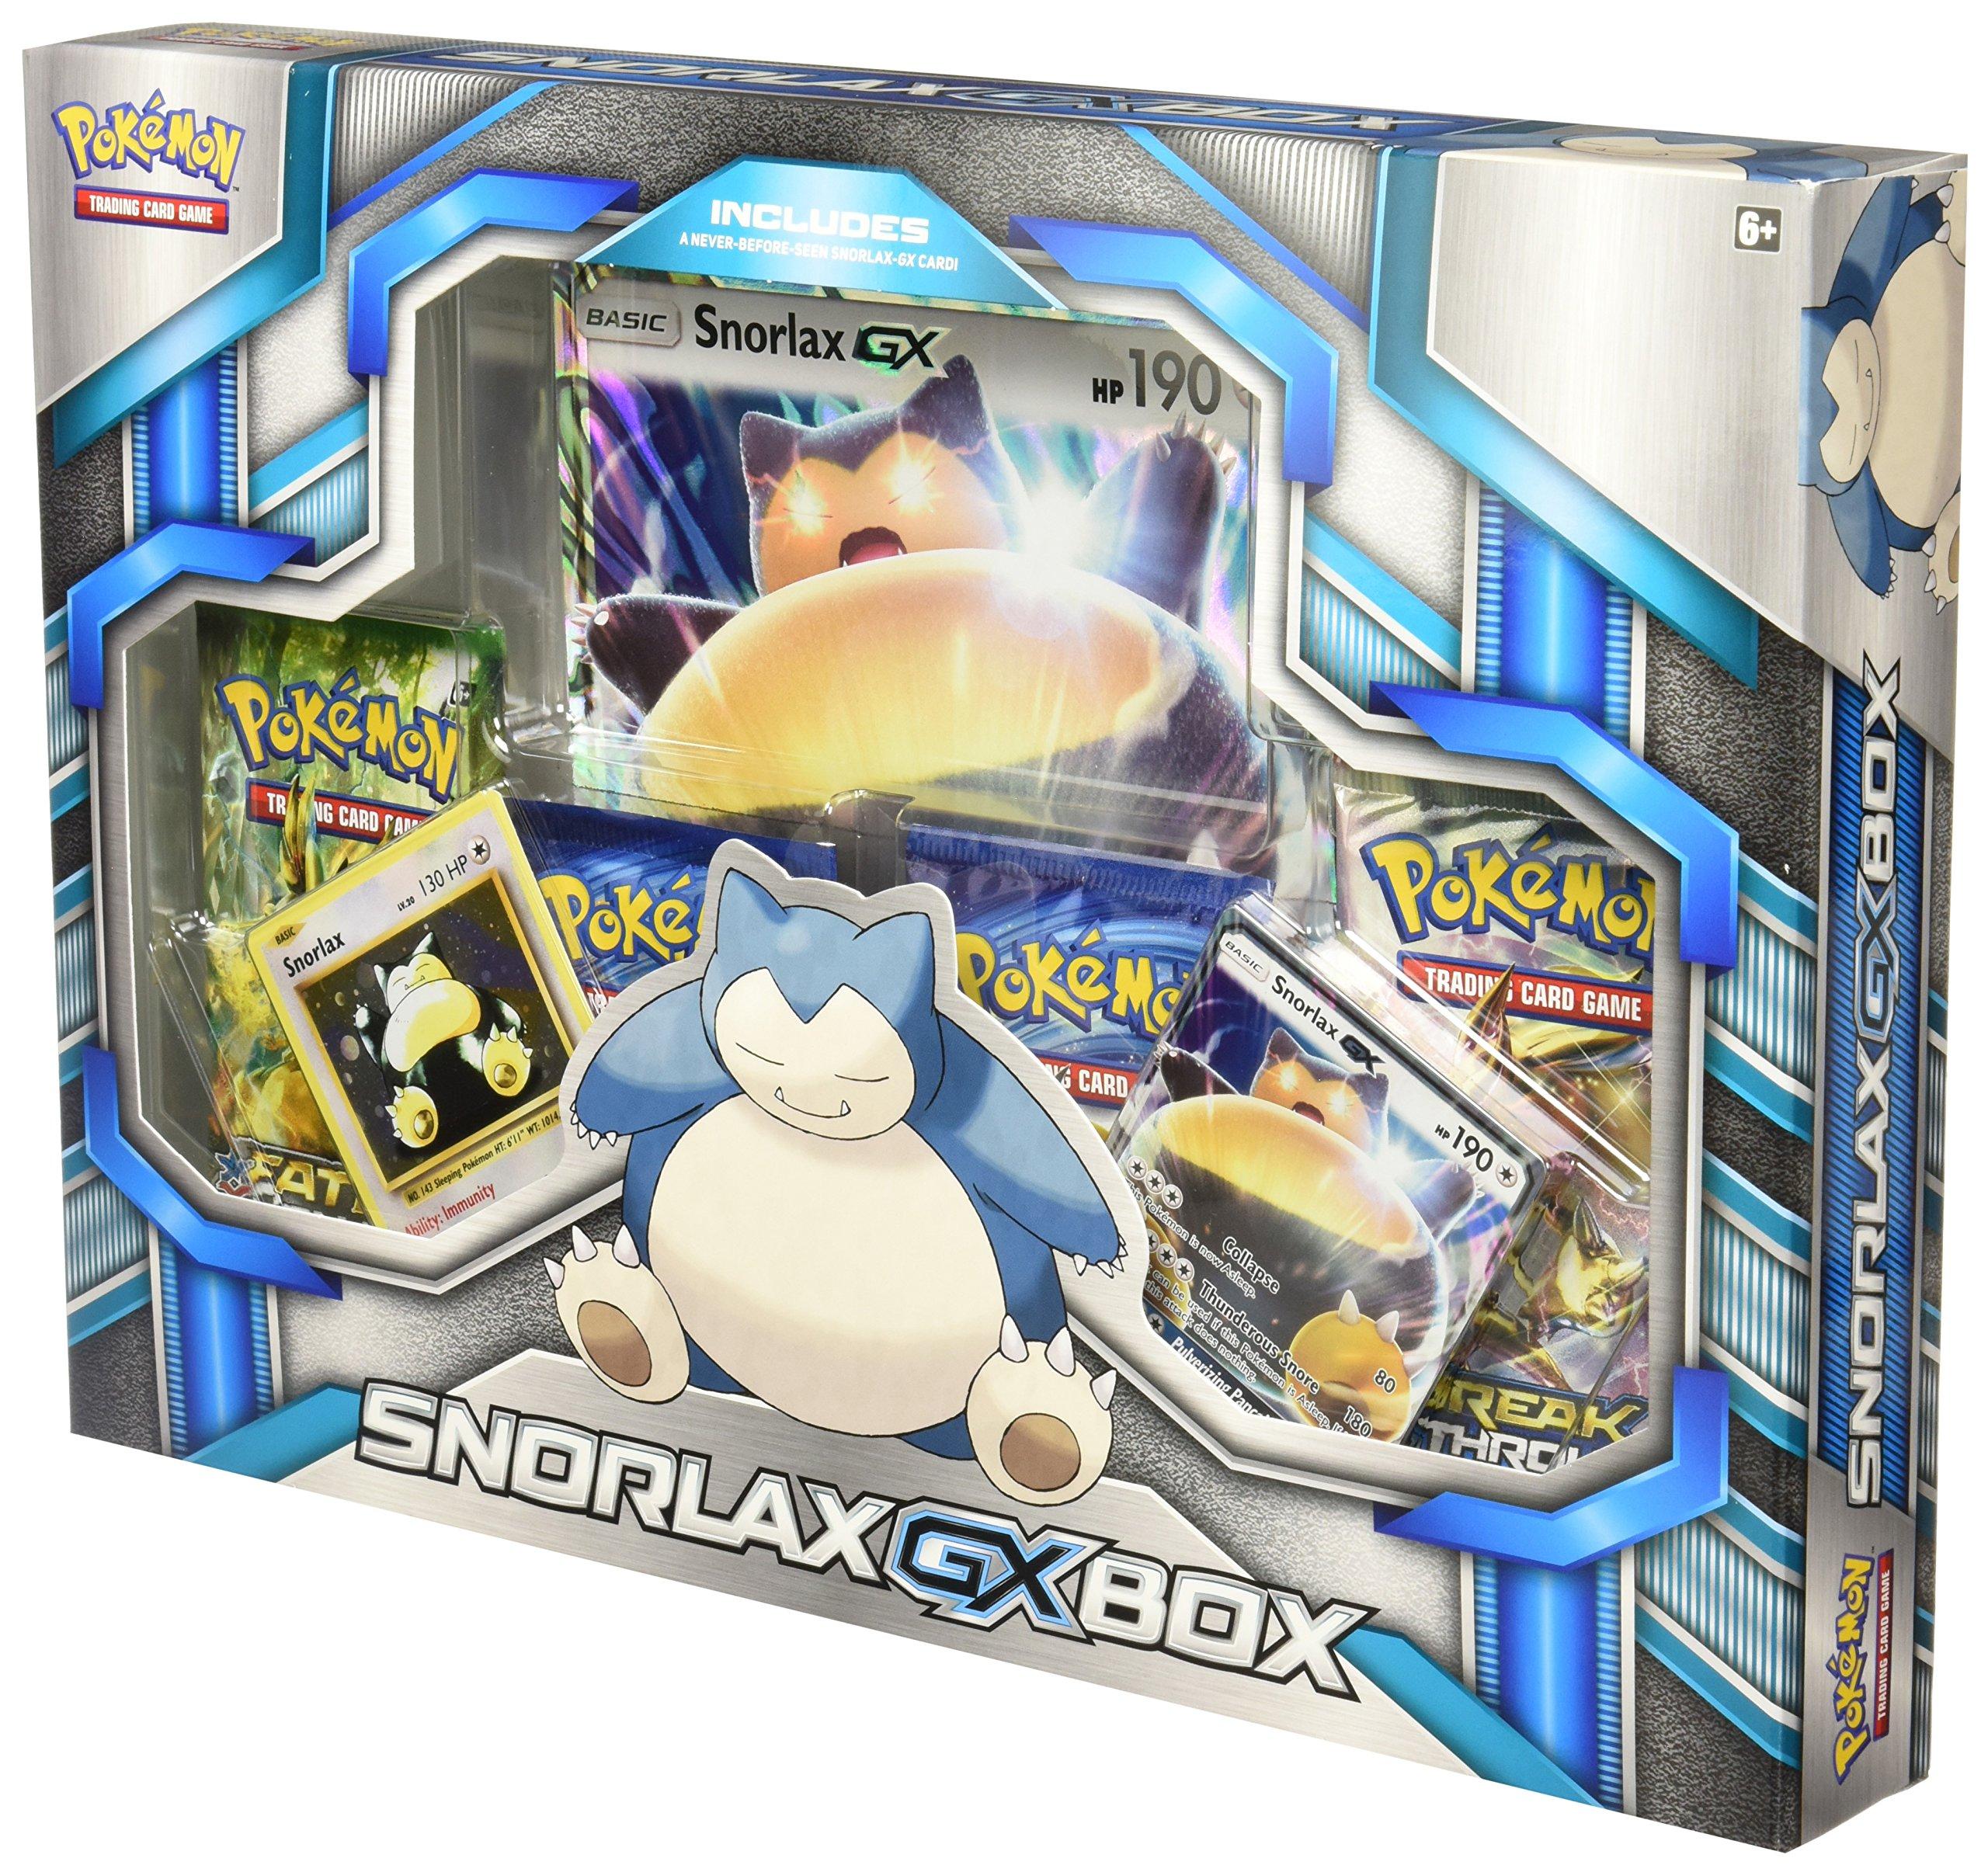 Pokemon TCG: Snorlax GX Box Card Game by Pokémon (Image #1)